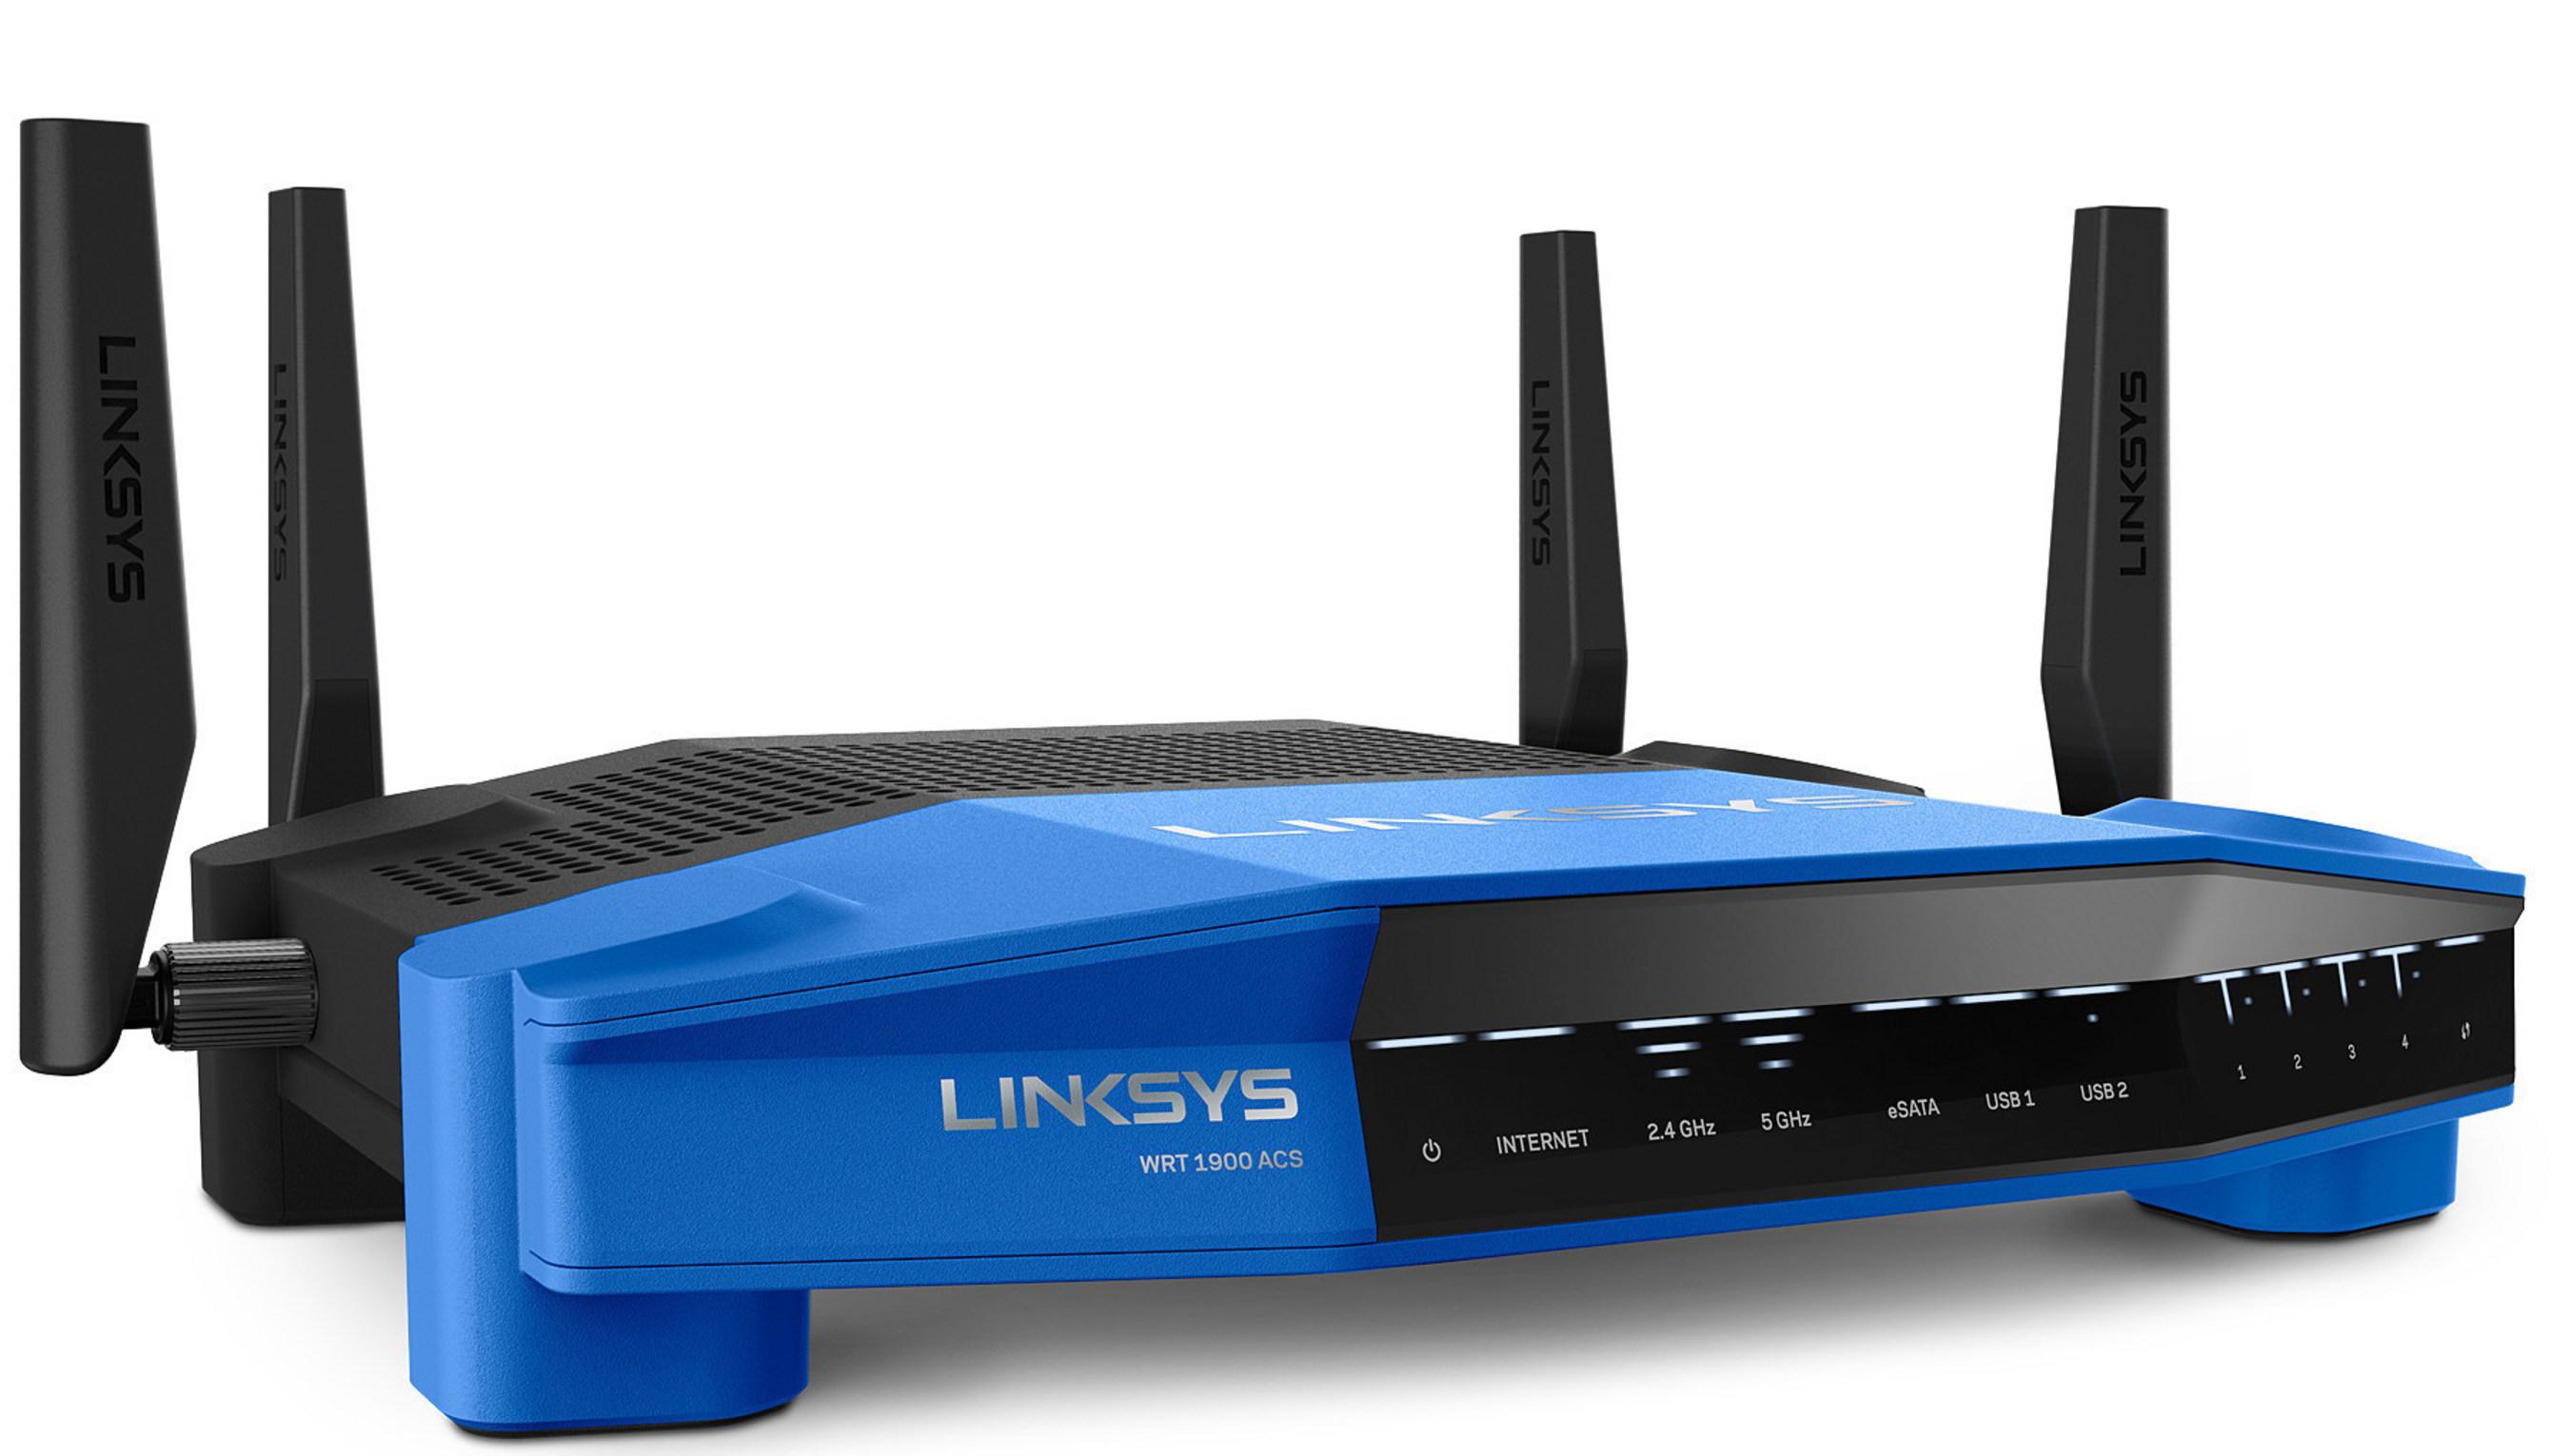 Linksys Makes The Award Winning WRT1900AC Wi-Fi Router Even Better